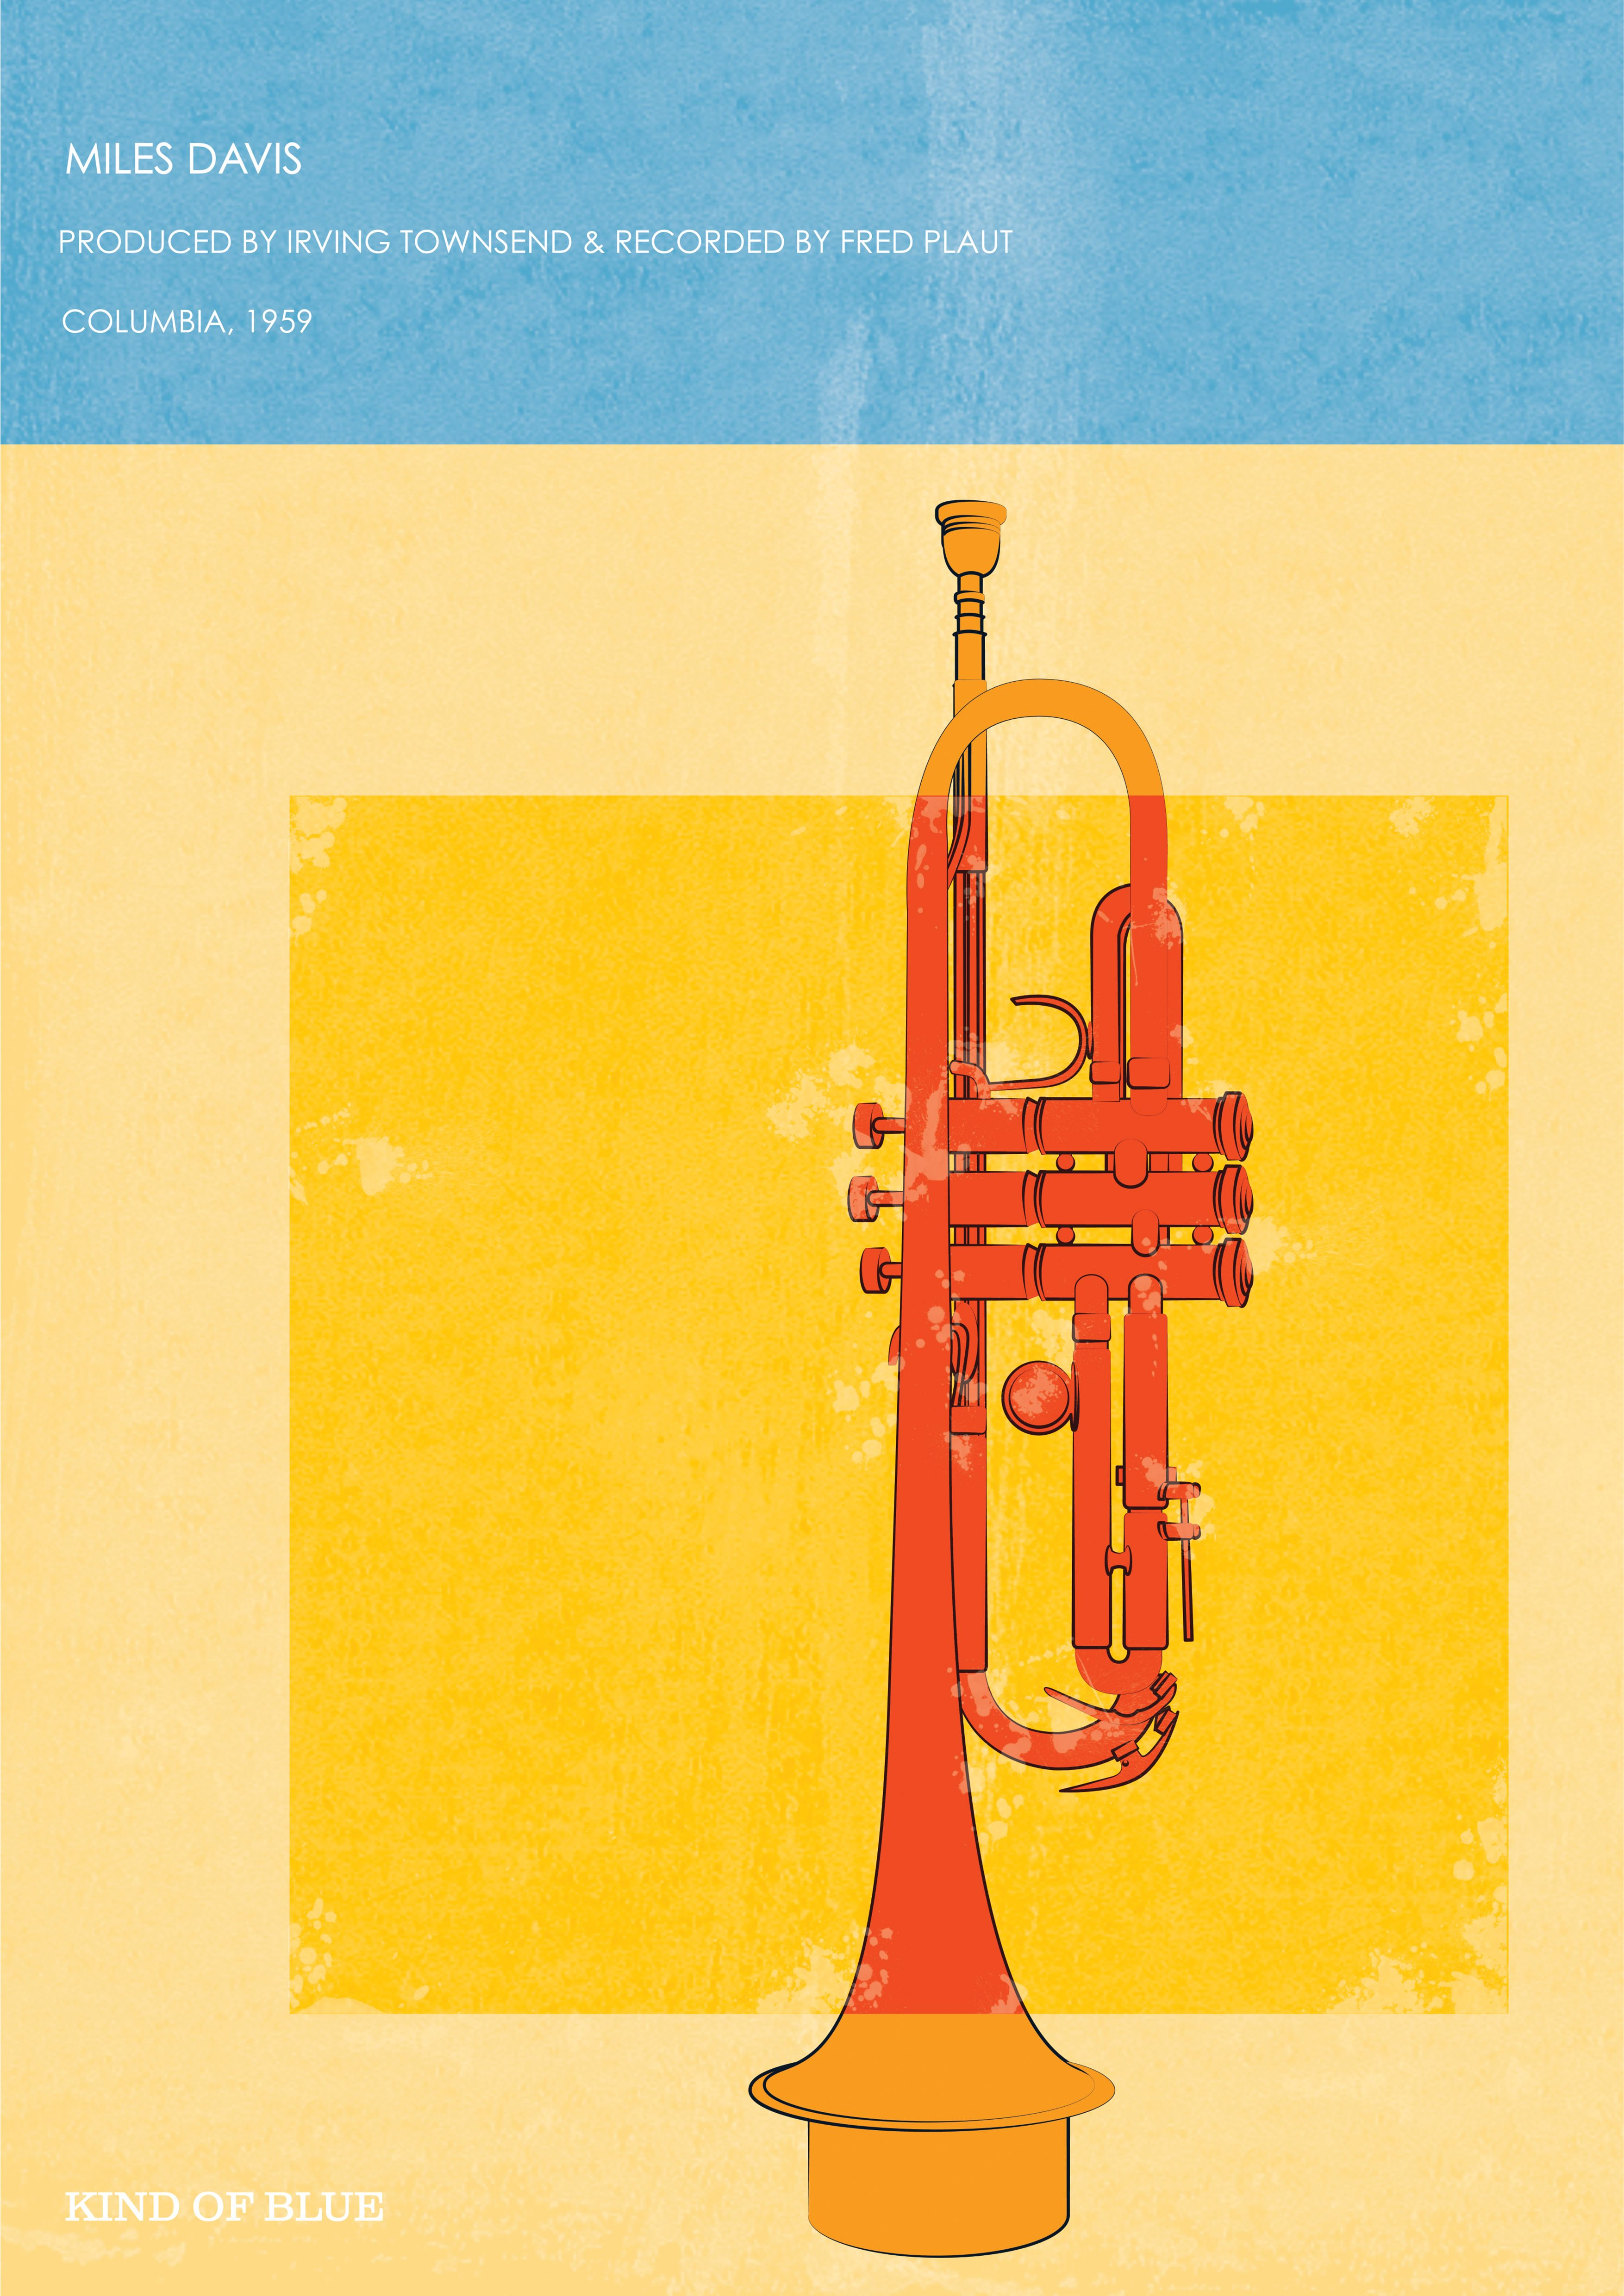 Poster Affiche Miles Davis Kind Of Blue Album Cover Jazz Trompette